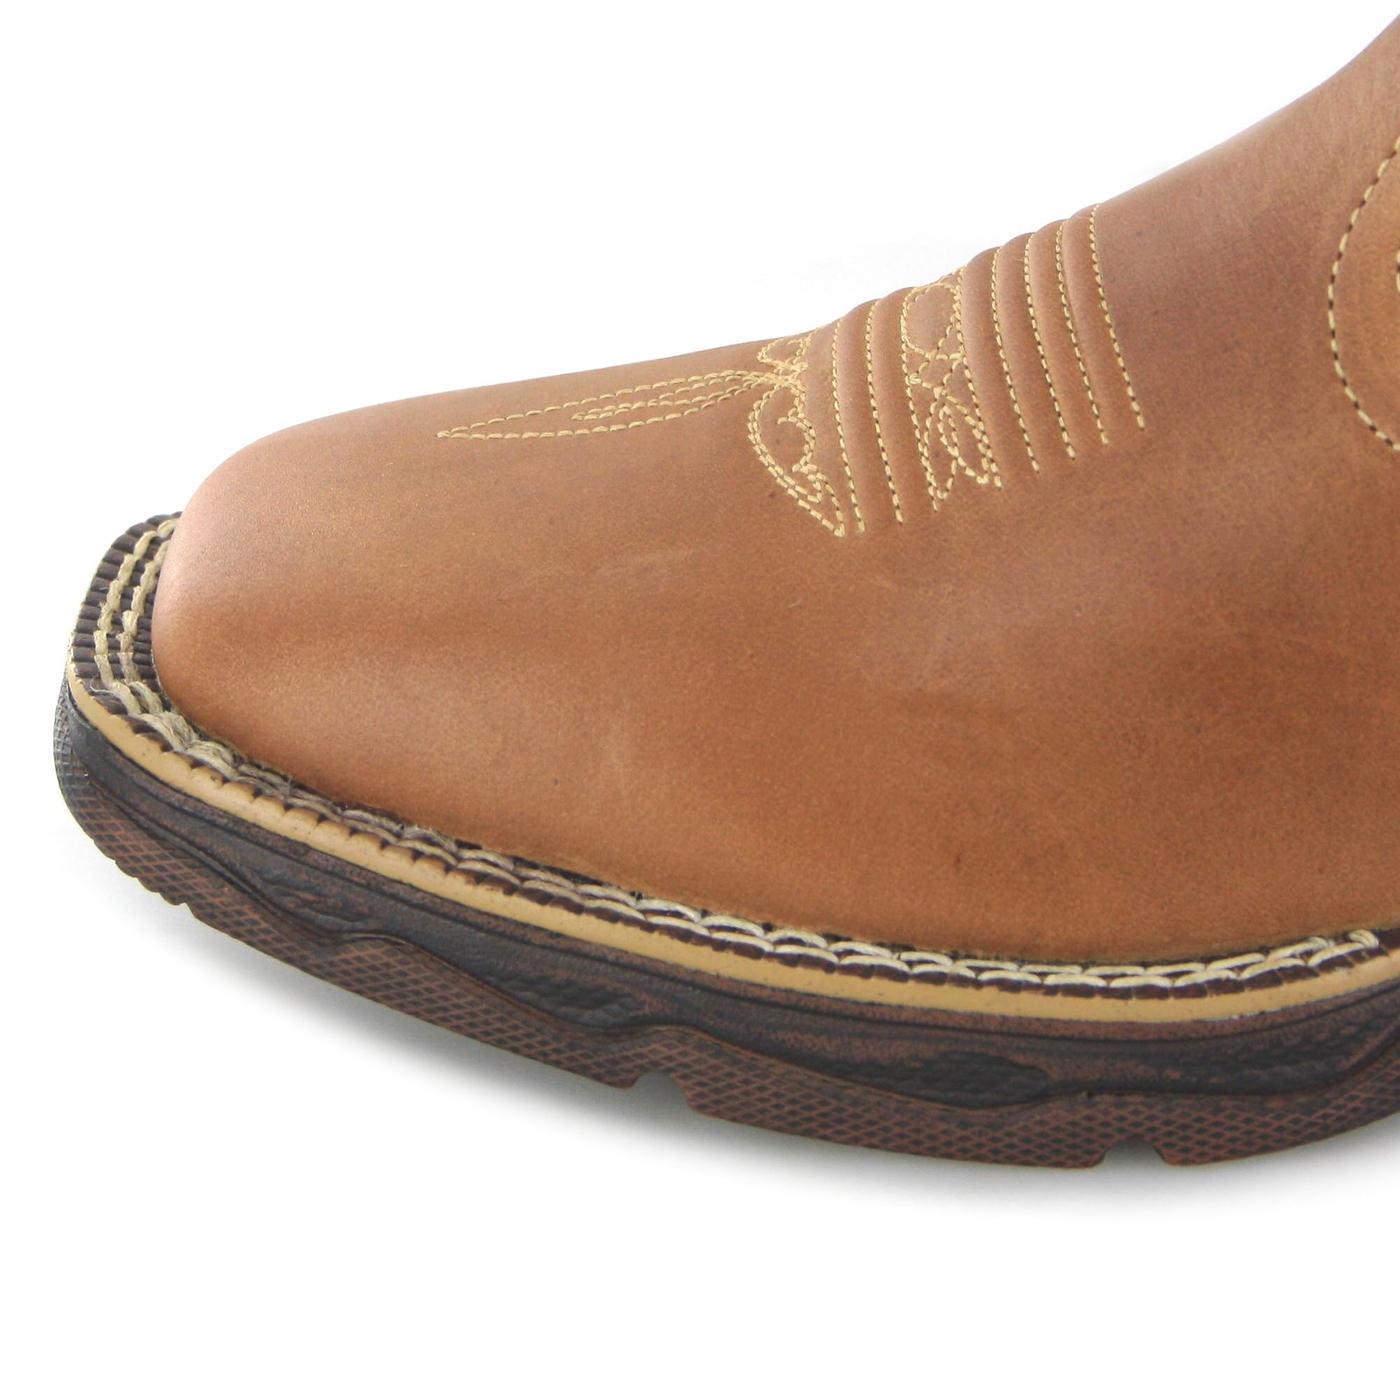 braun Boots Brown DRD0107 Durango LADY REBEL Westernreitstiefel OuXPkwZiT